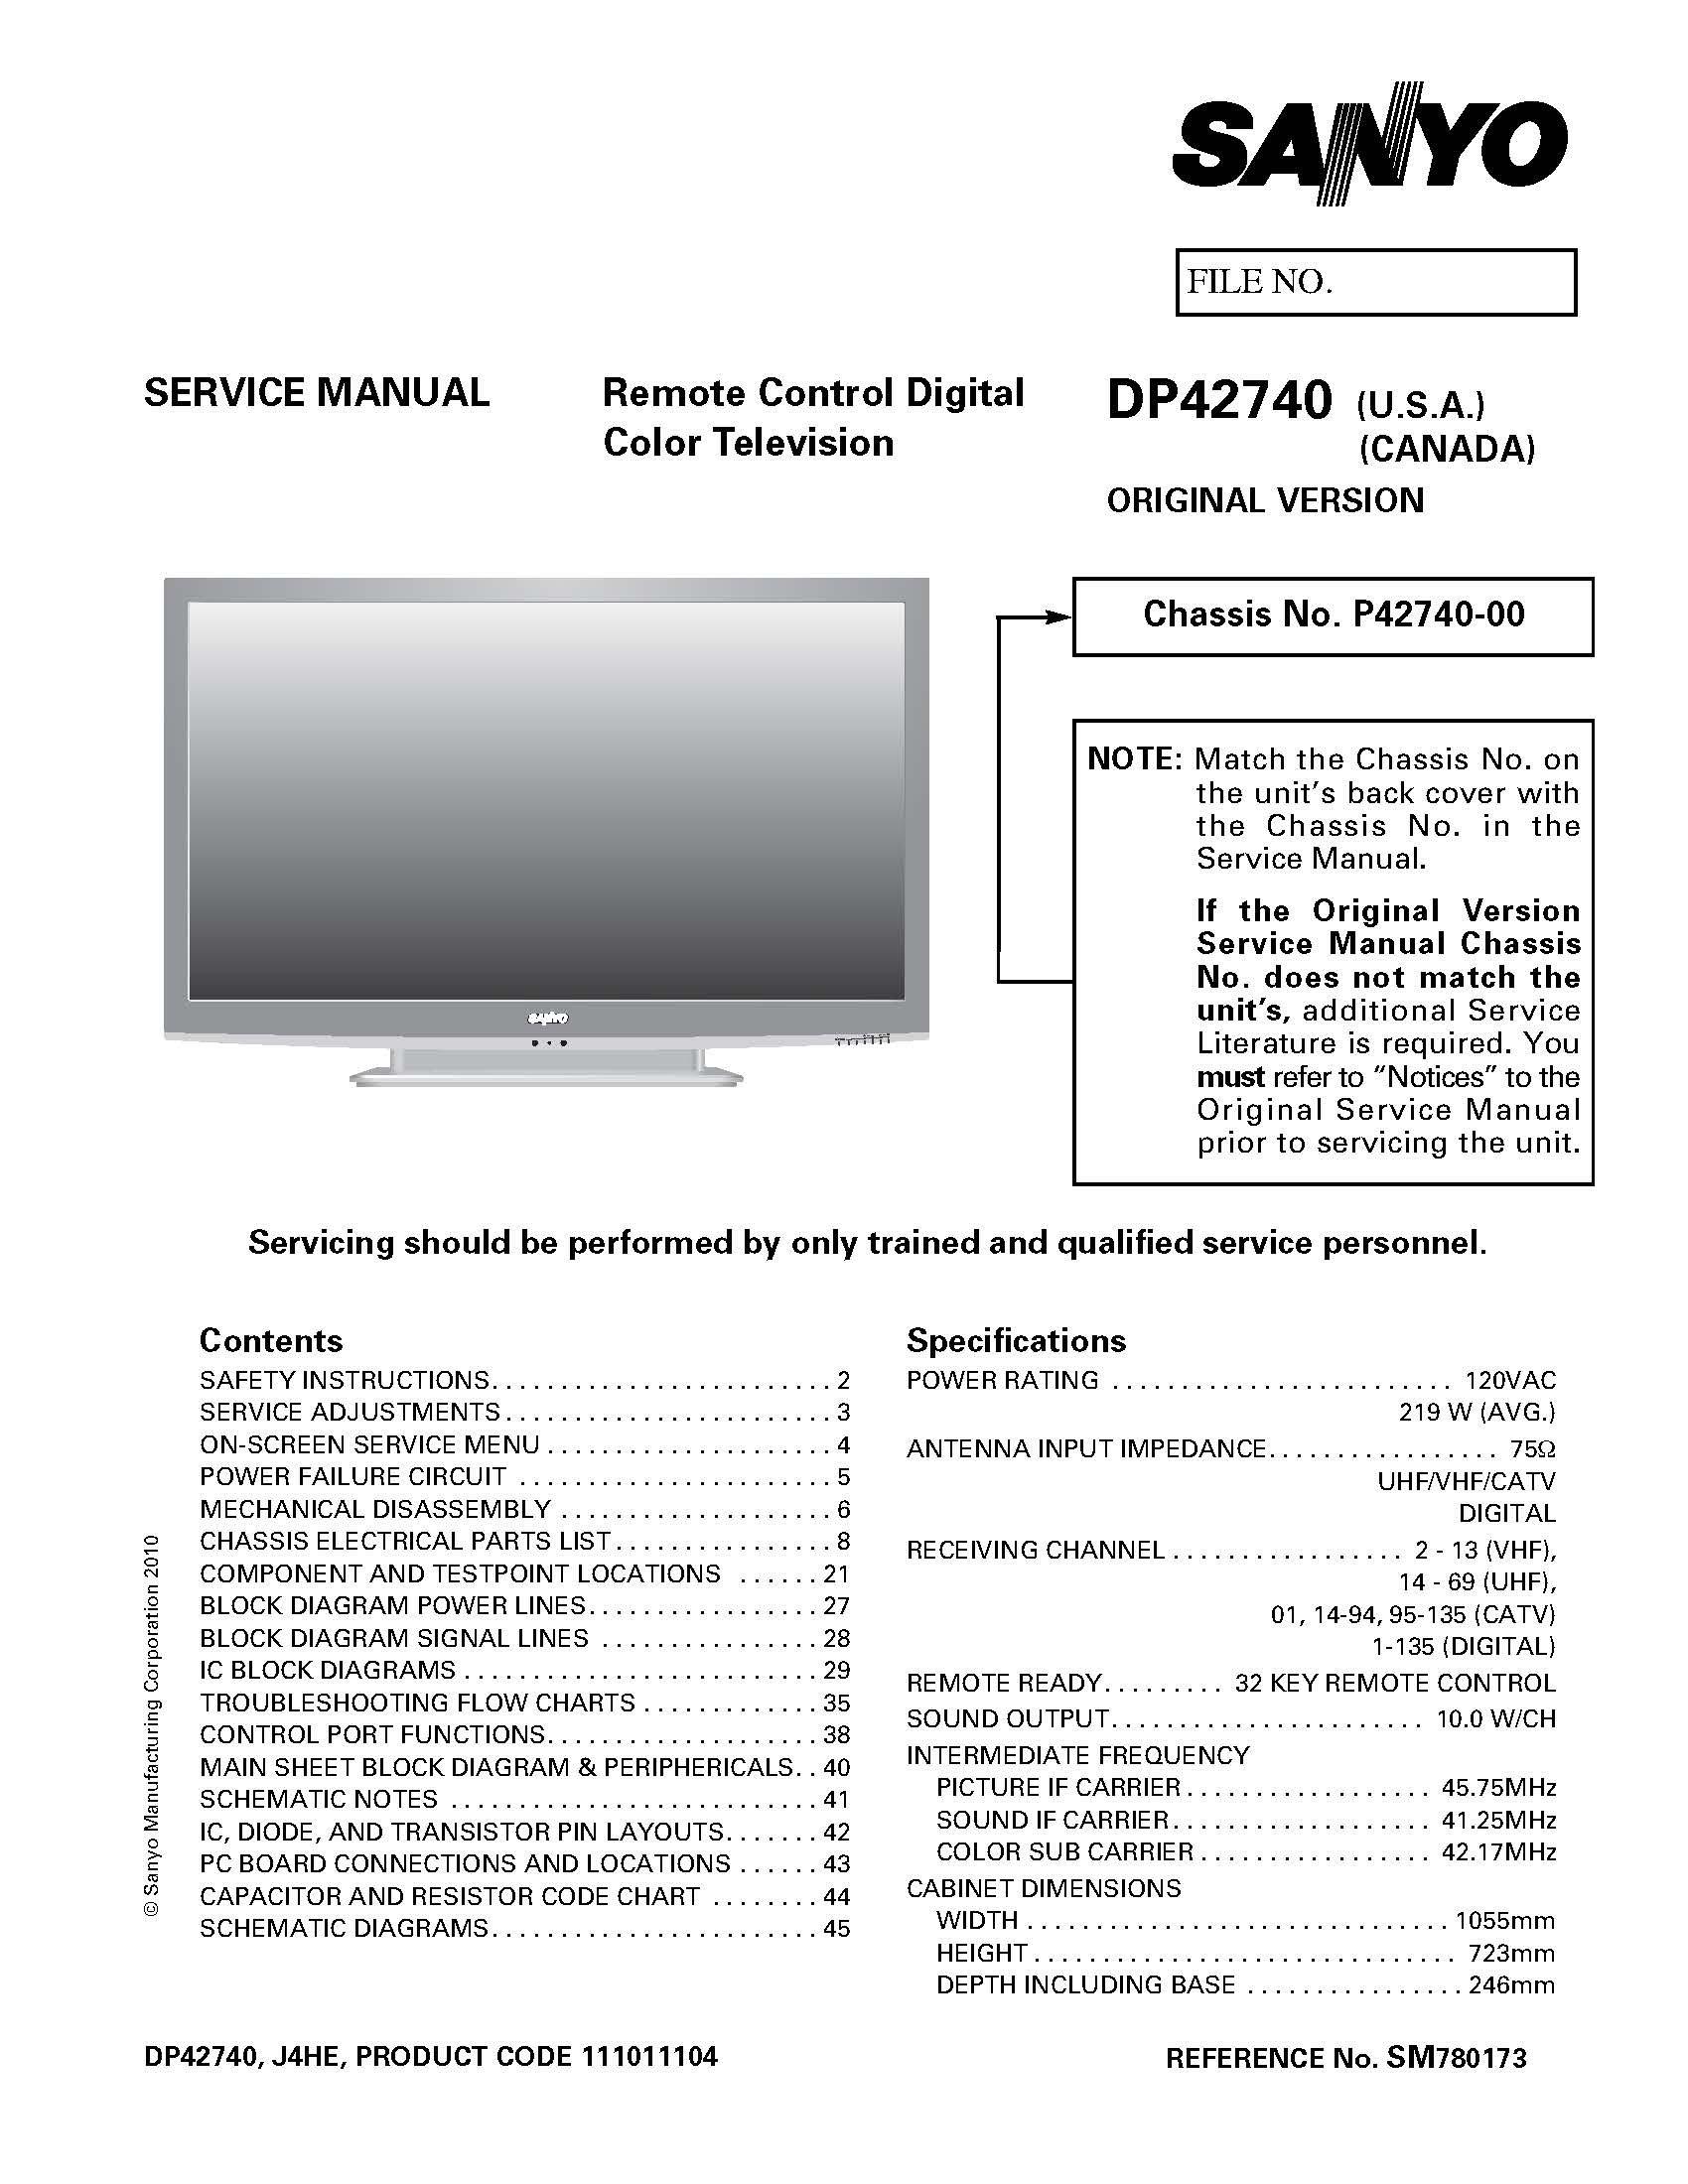 Sanyo Dp42740 More Models Service Manual Books Pin Tv Monitor Diagram Blog Electronic Circuit Design On Pinterest